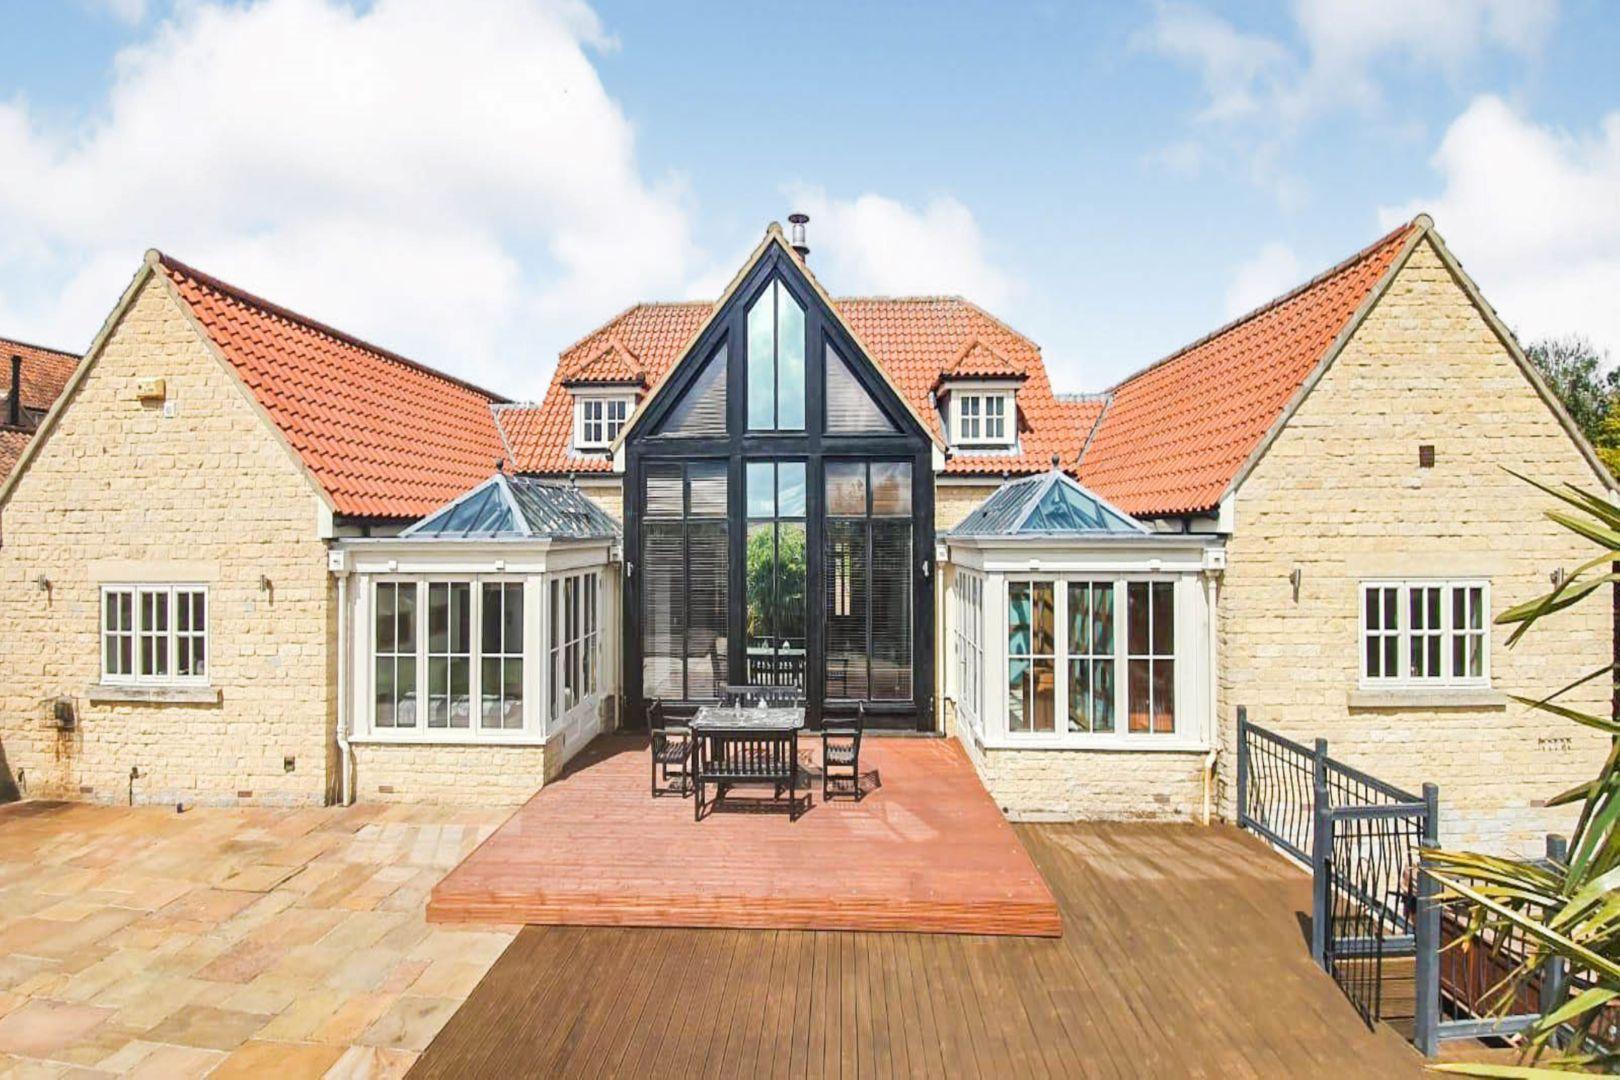 Purplebricks - Best Online Estate Agents. Free Valuations. Local Experts.